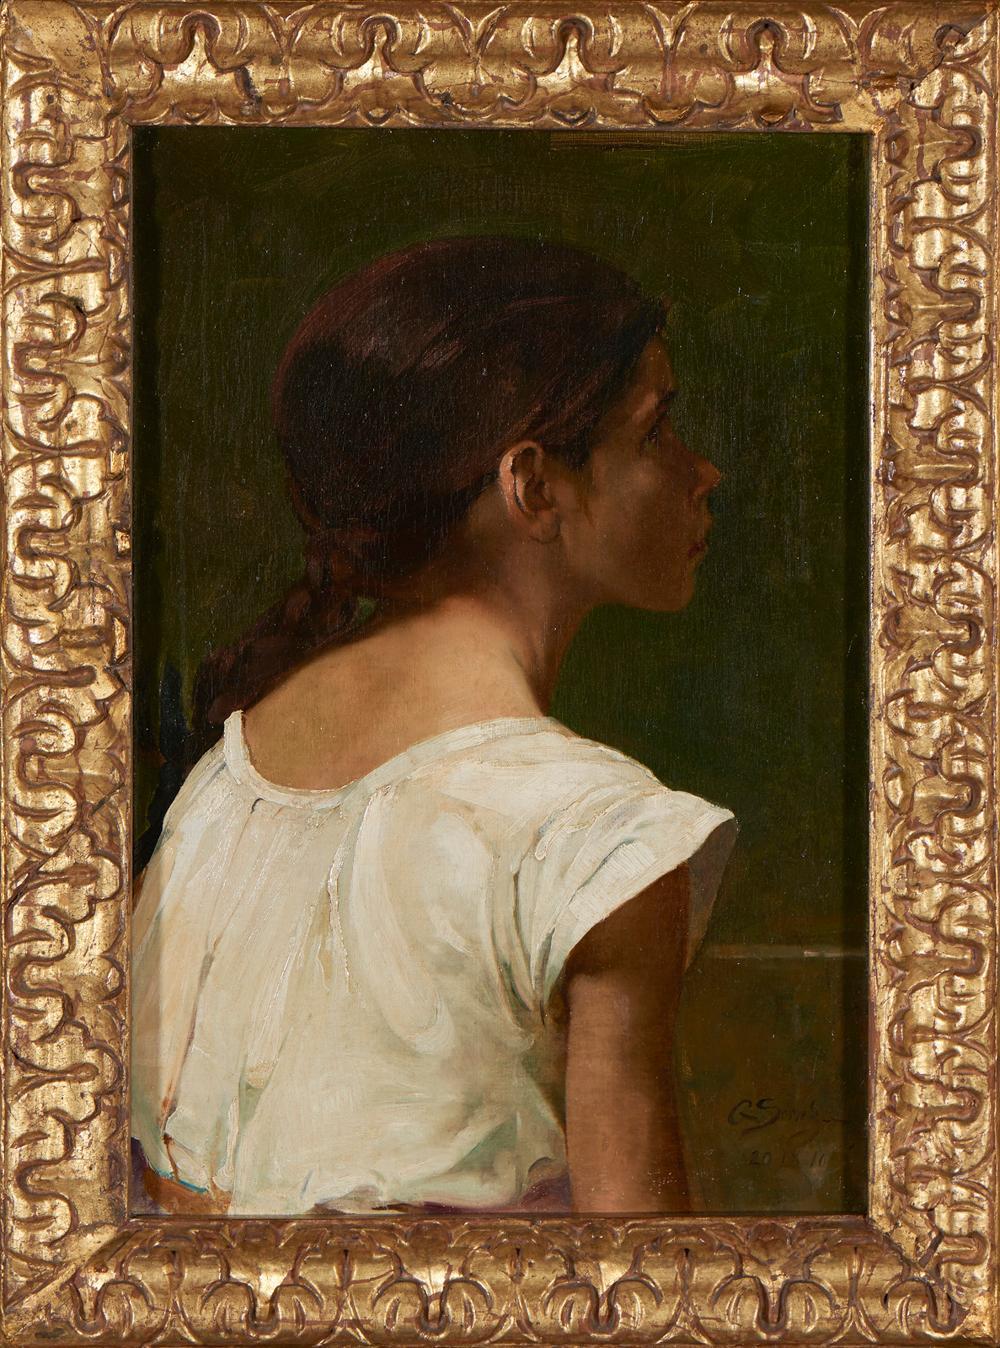 AURÉLIA DE SOUSA, Óleo sobre tela, 55 x 37,5 cm.